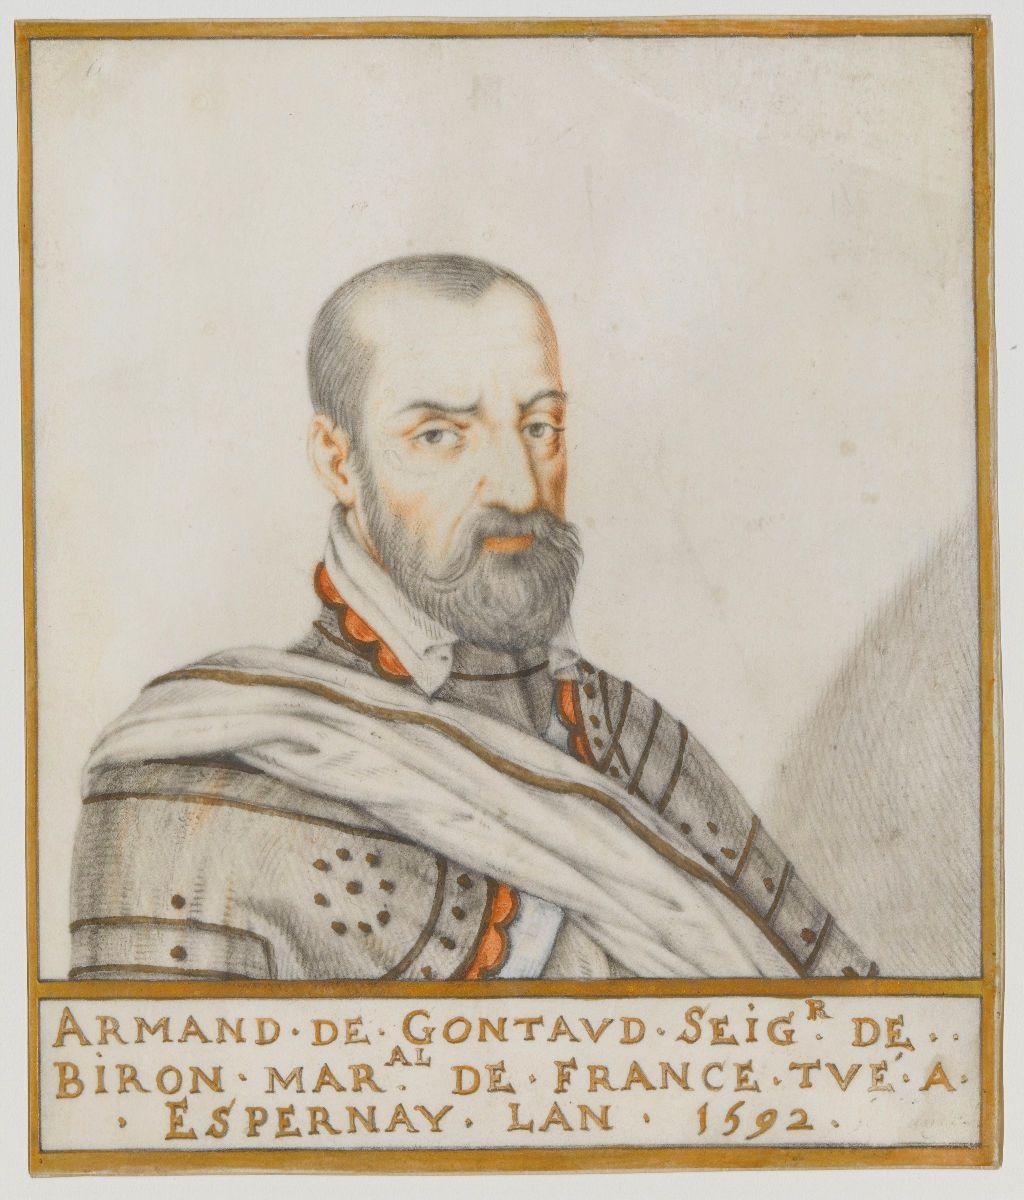 Portrait of Armand de Gontaud, baron de Biron